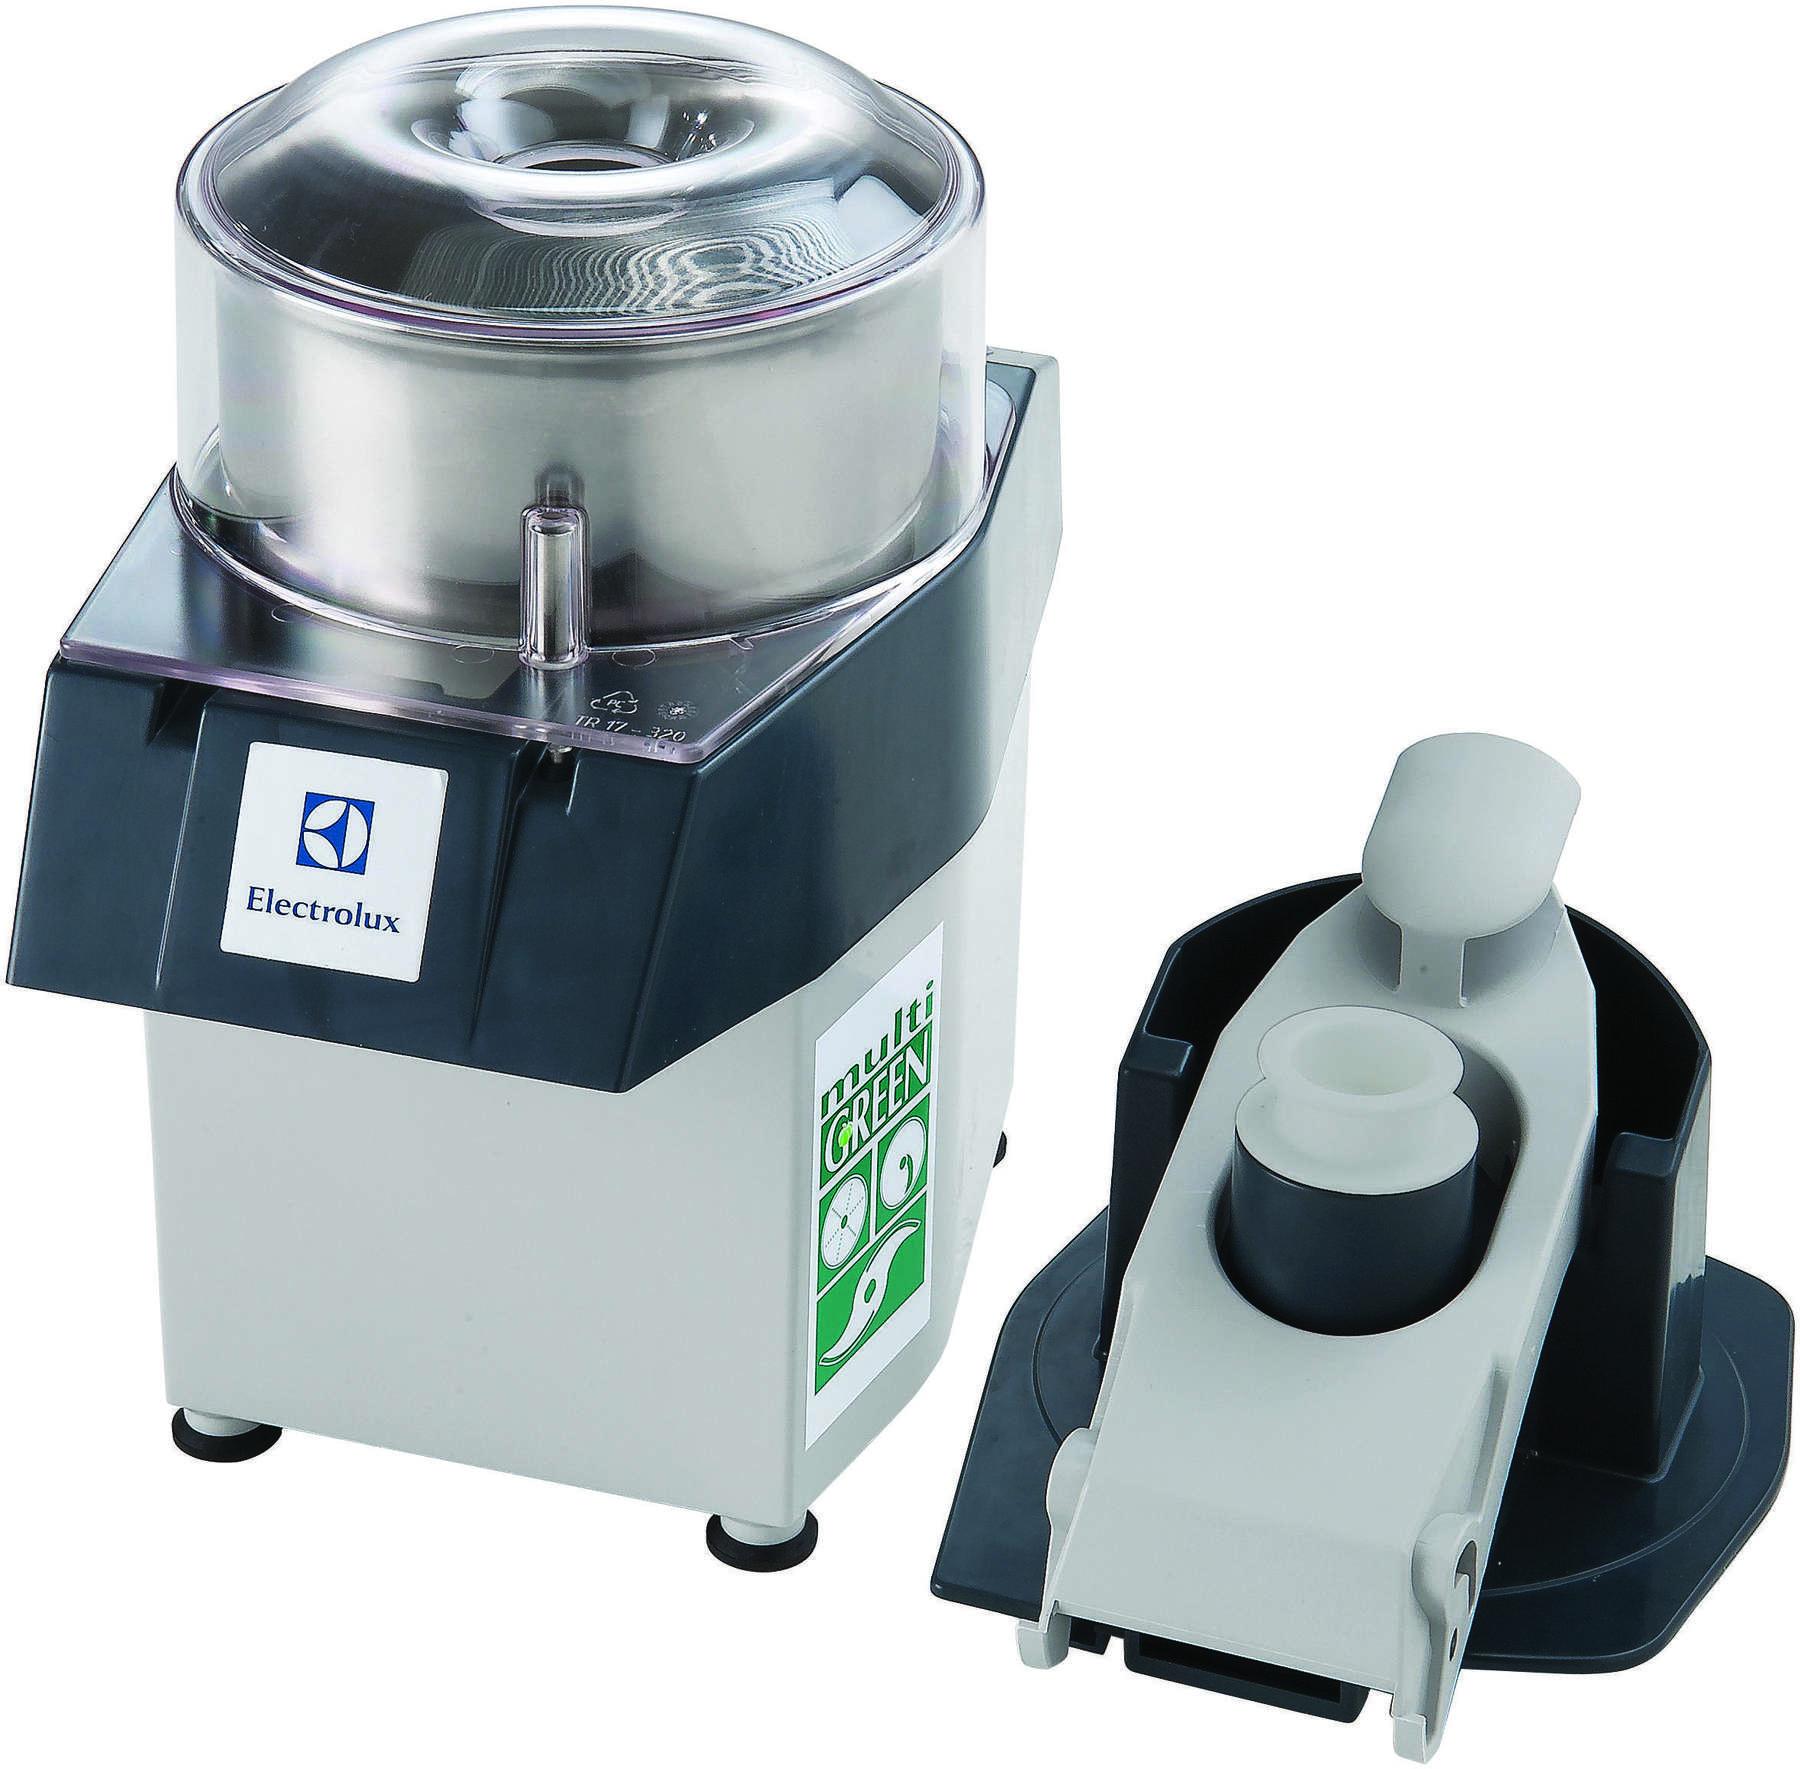 Electrolux Professional 603810 (MUGYU) Multi | CKitchen.com